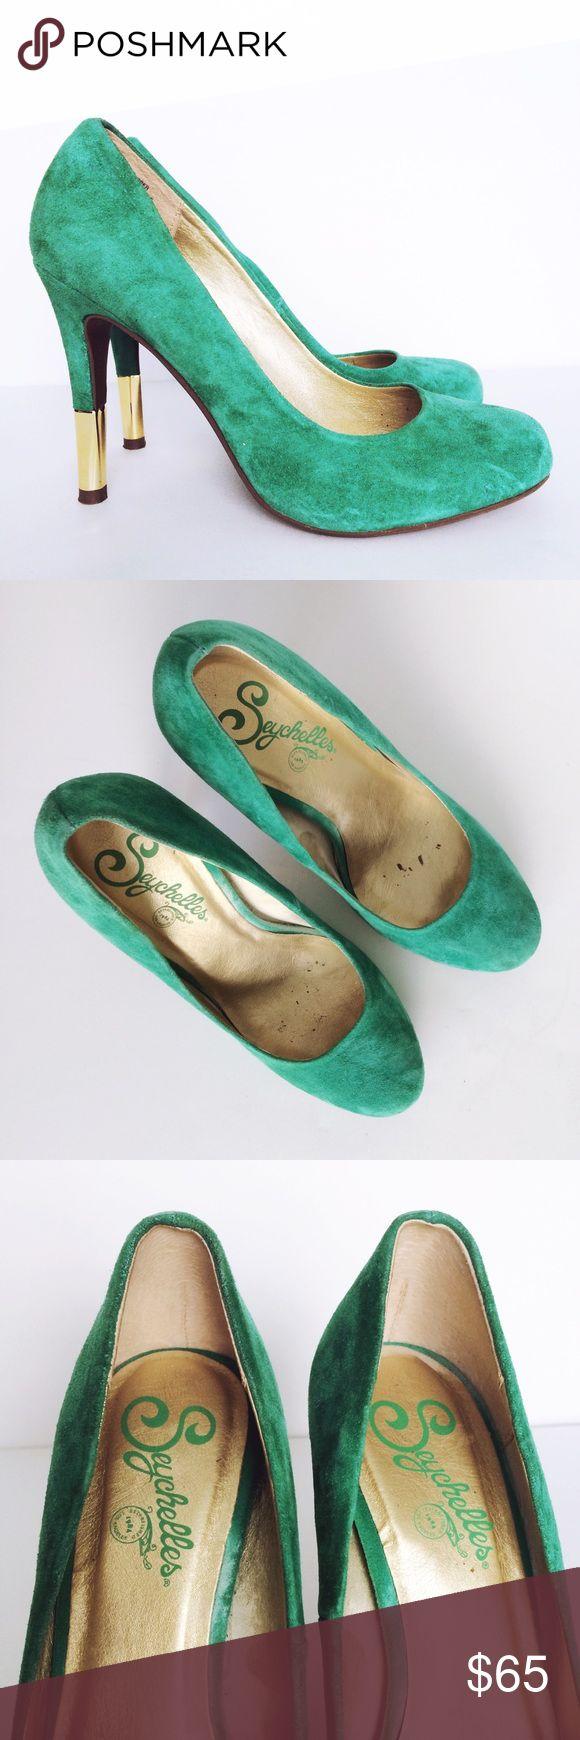 I just added this listing on Poshmark: Seychelles green suede pumps. #shopmycloset #poshmark #fashion #shopping #style #forsale #Seychelles #Shoes